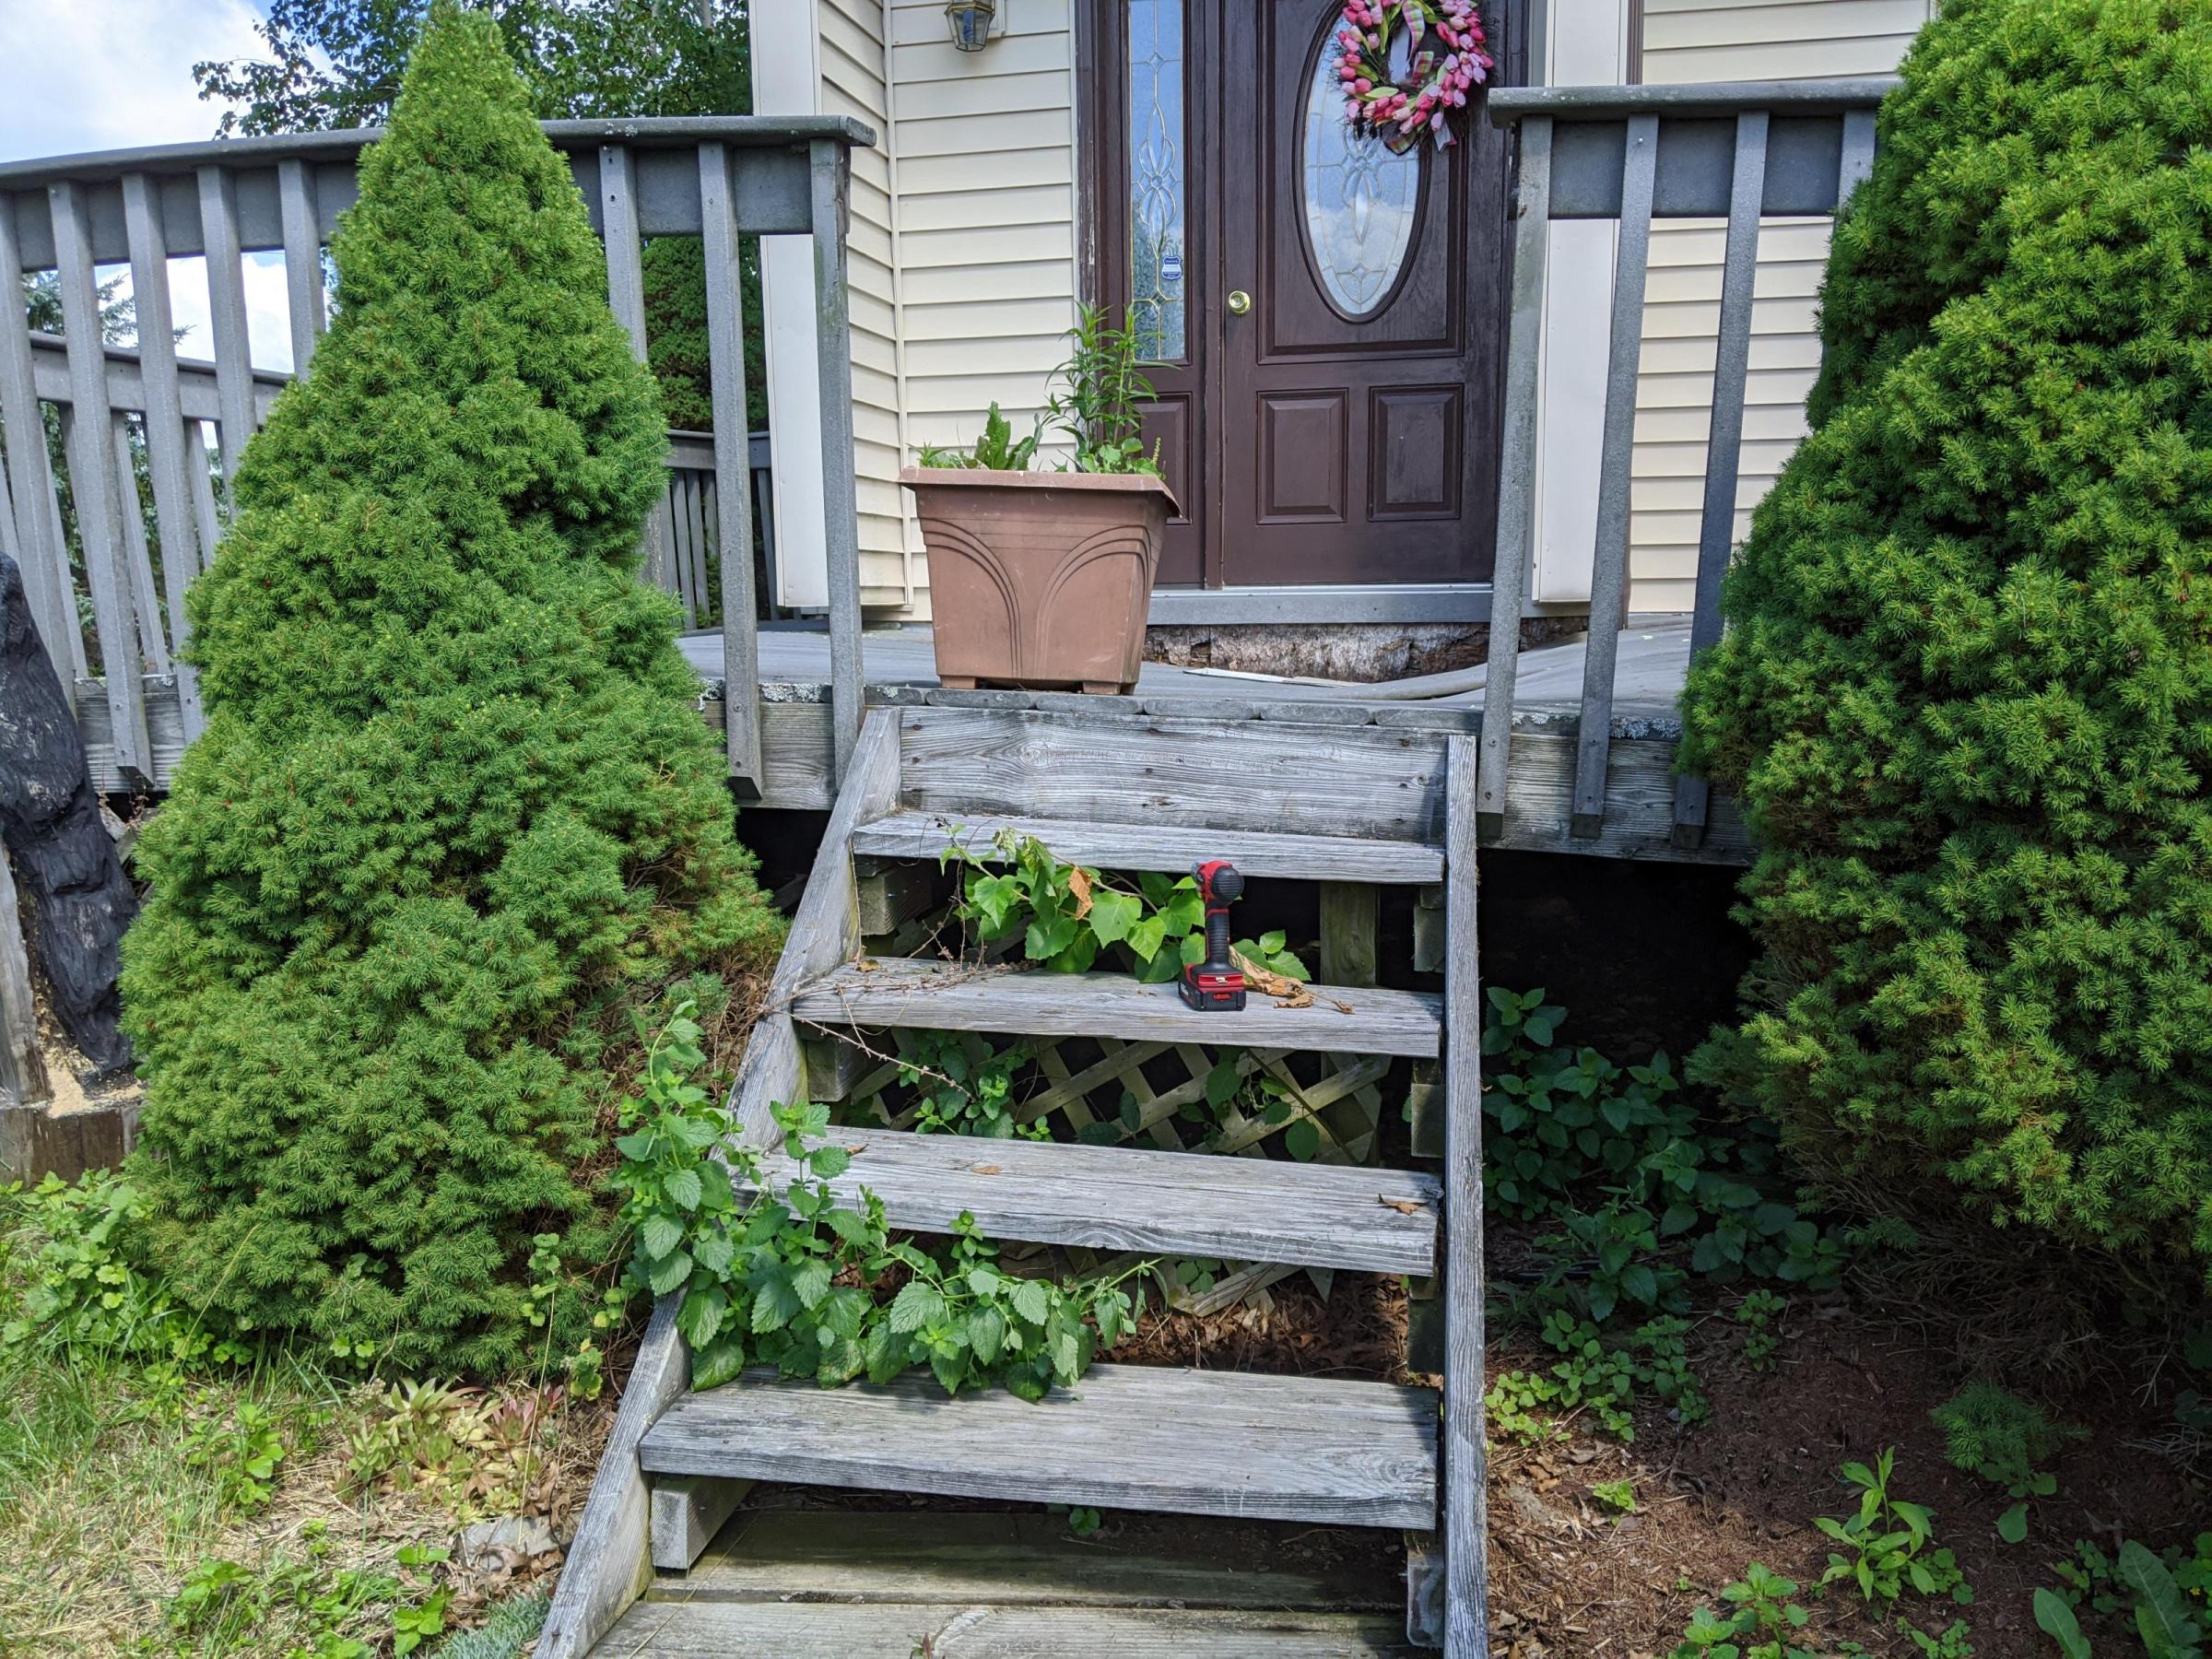 Front porch rebuild-img_20200629_104901_1593443533212.jpg